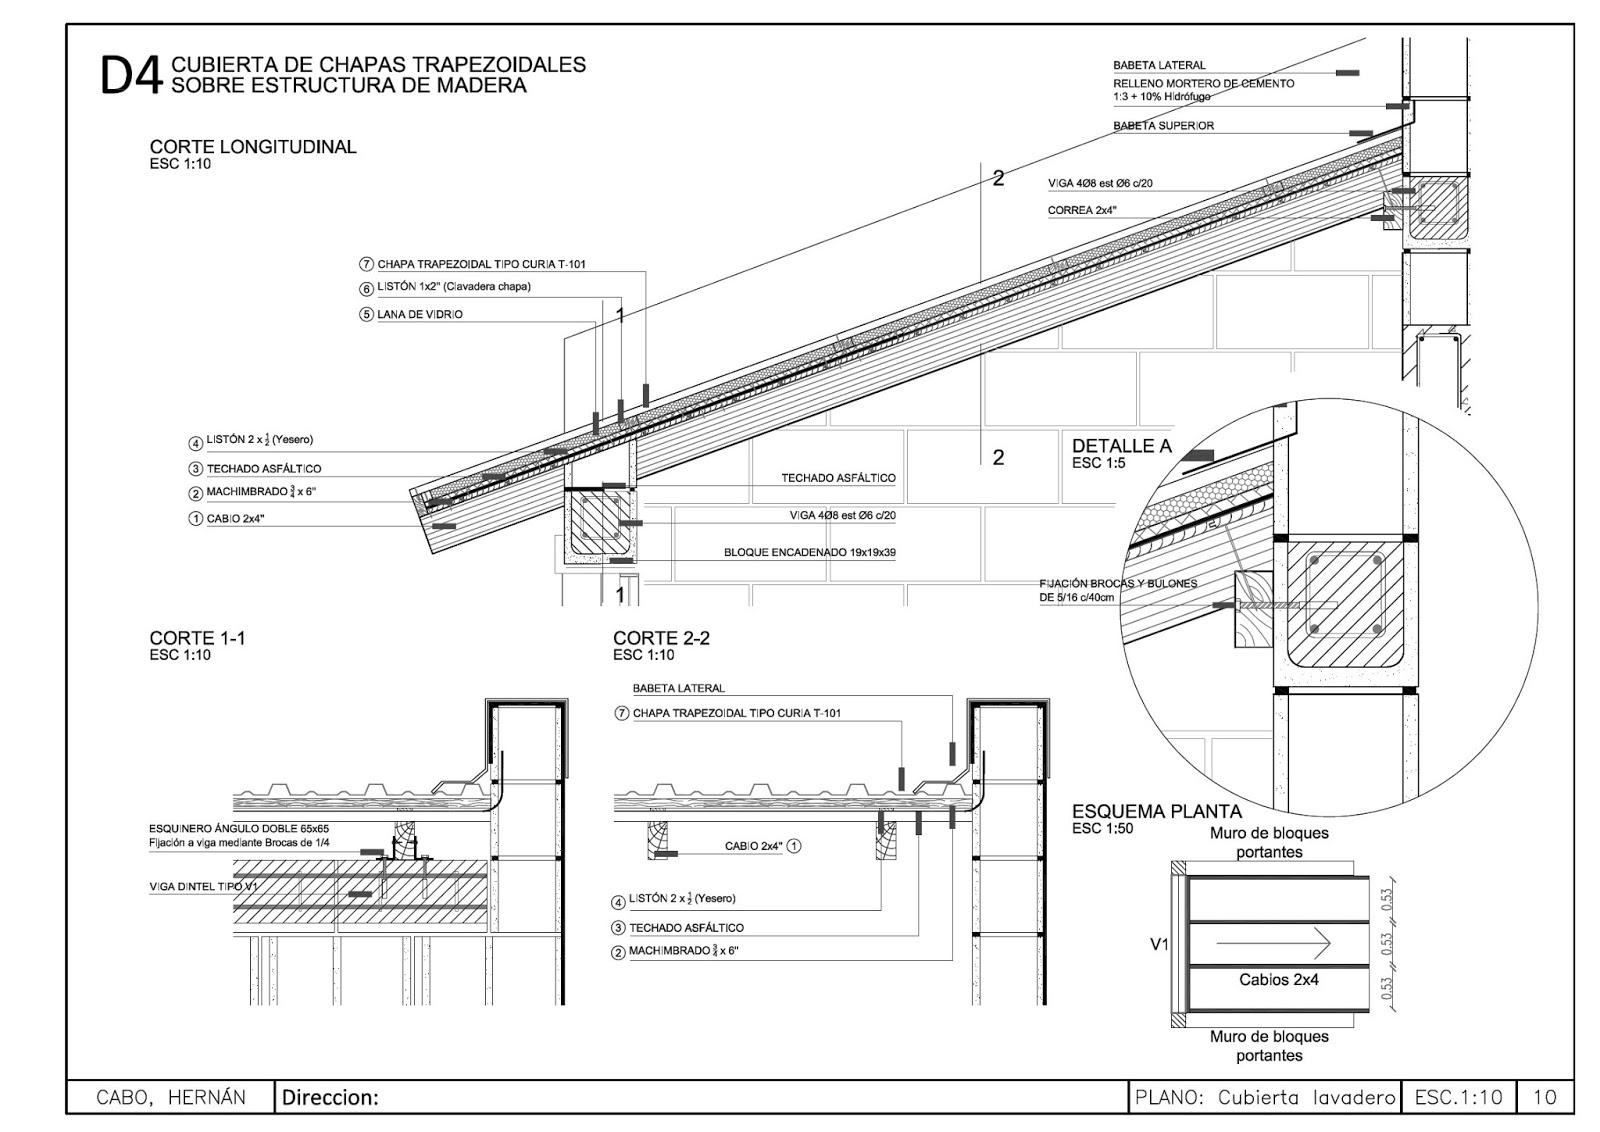 Detalles constructivos cad - Detalle constructivo techo ...